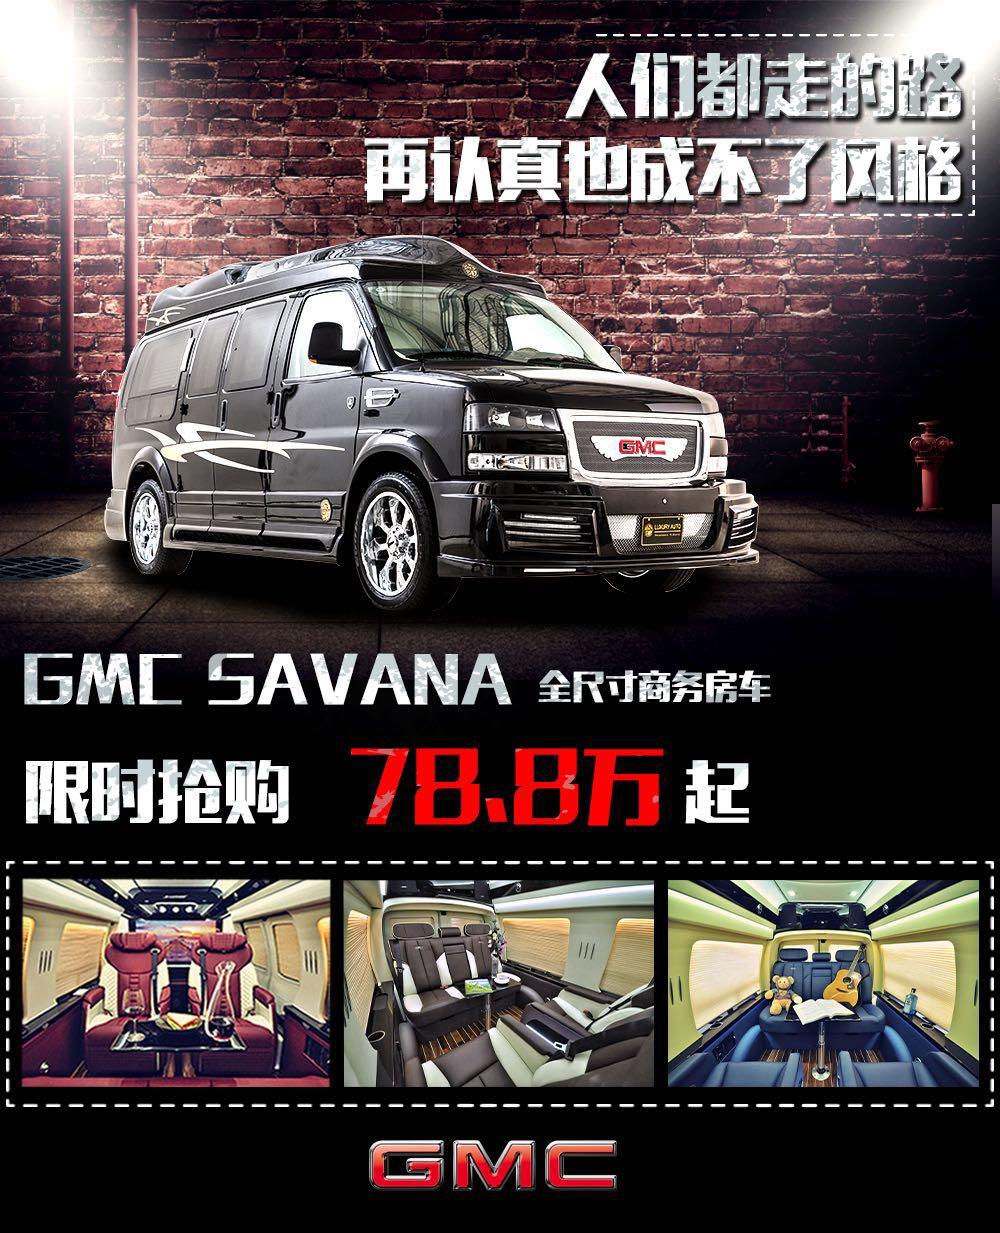 GMC房车私人定制美式进口1500特价现车-图2